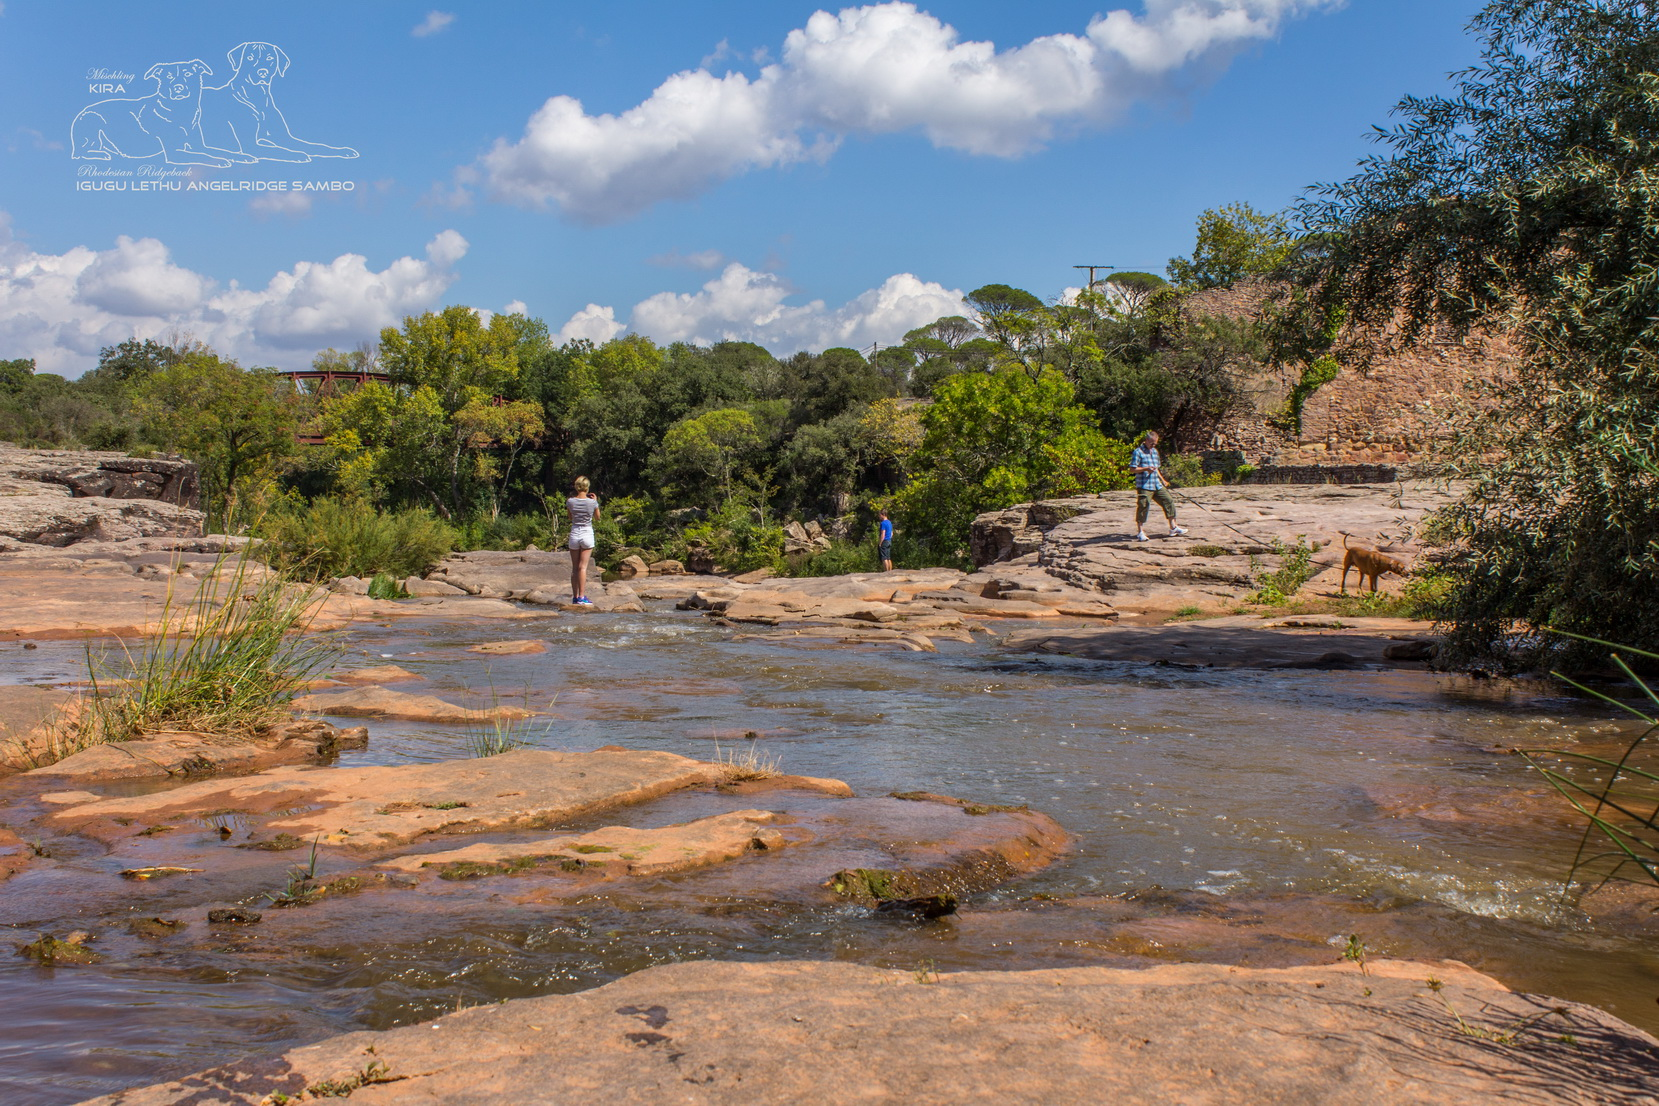 Pfeiffers - Wasserfall Vidauban 1